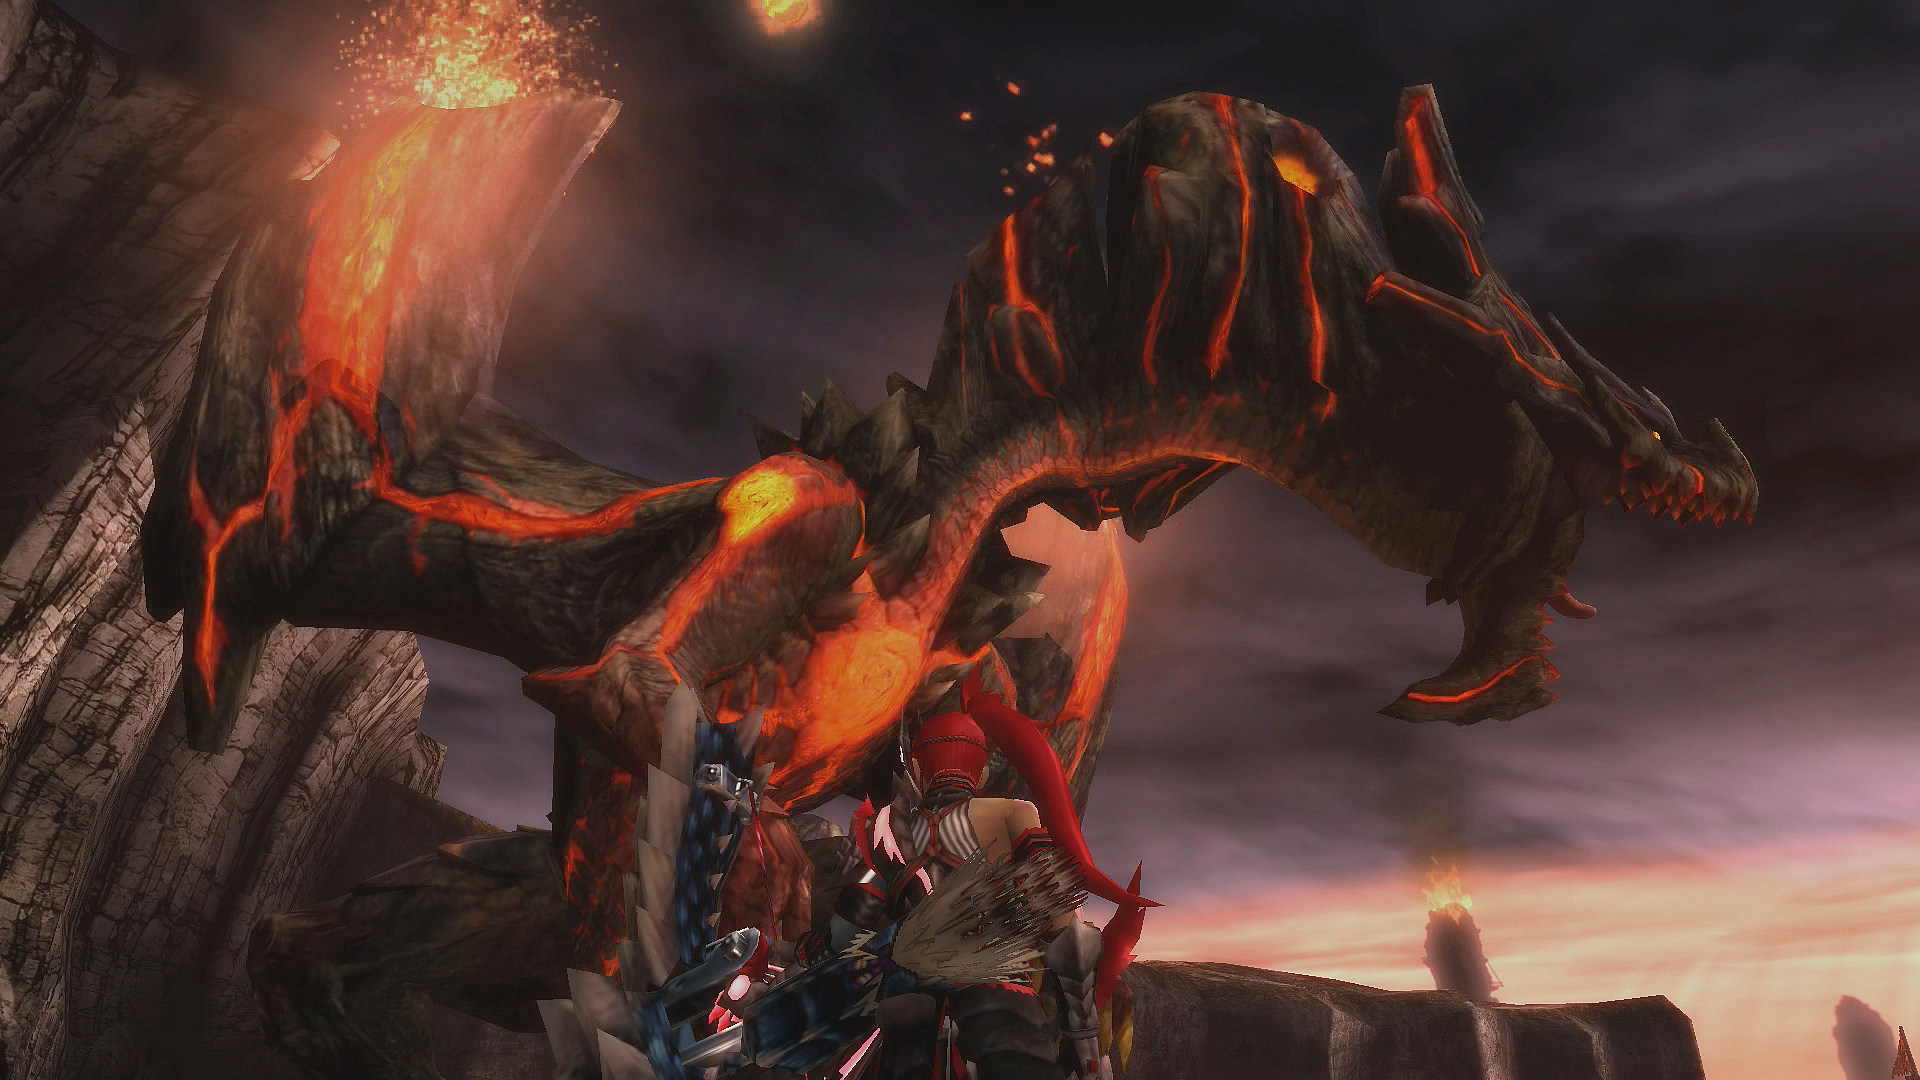 Dire Miralis Monster Hunter Vs The Warrior Borderlands 2